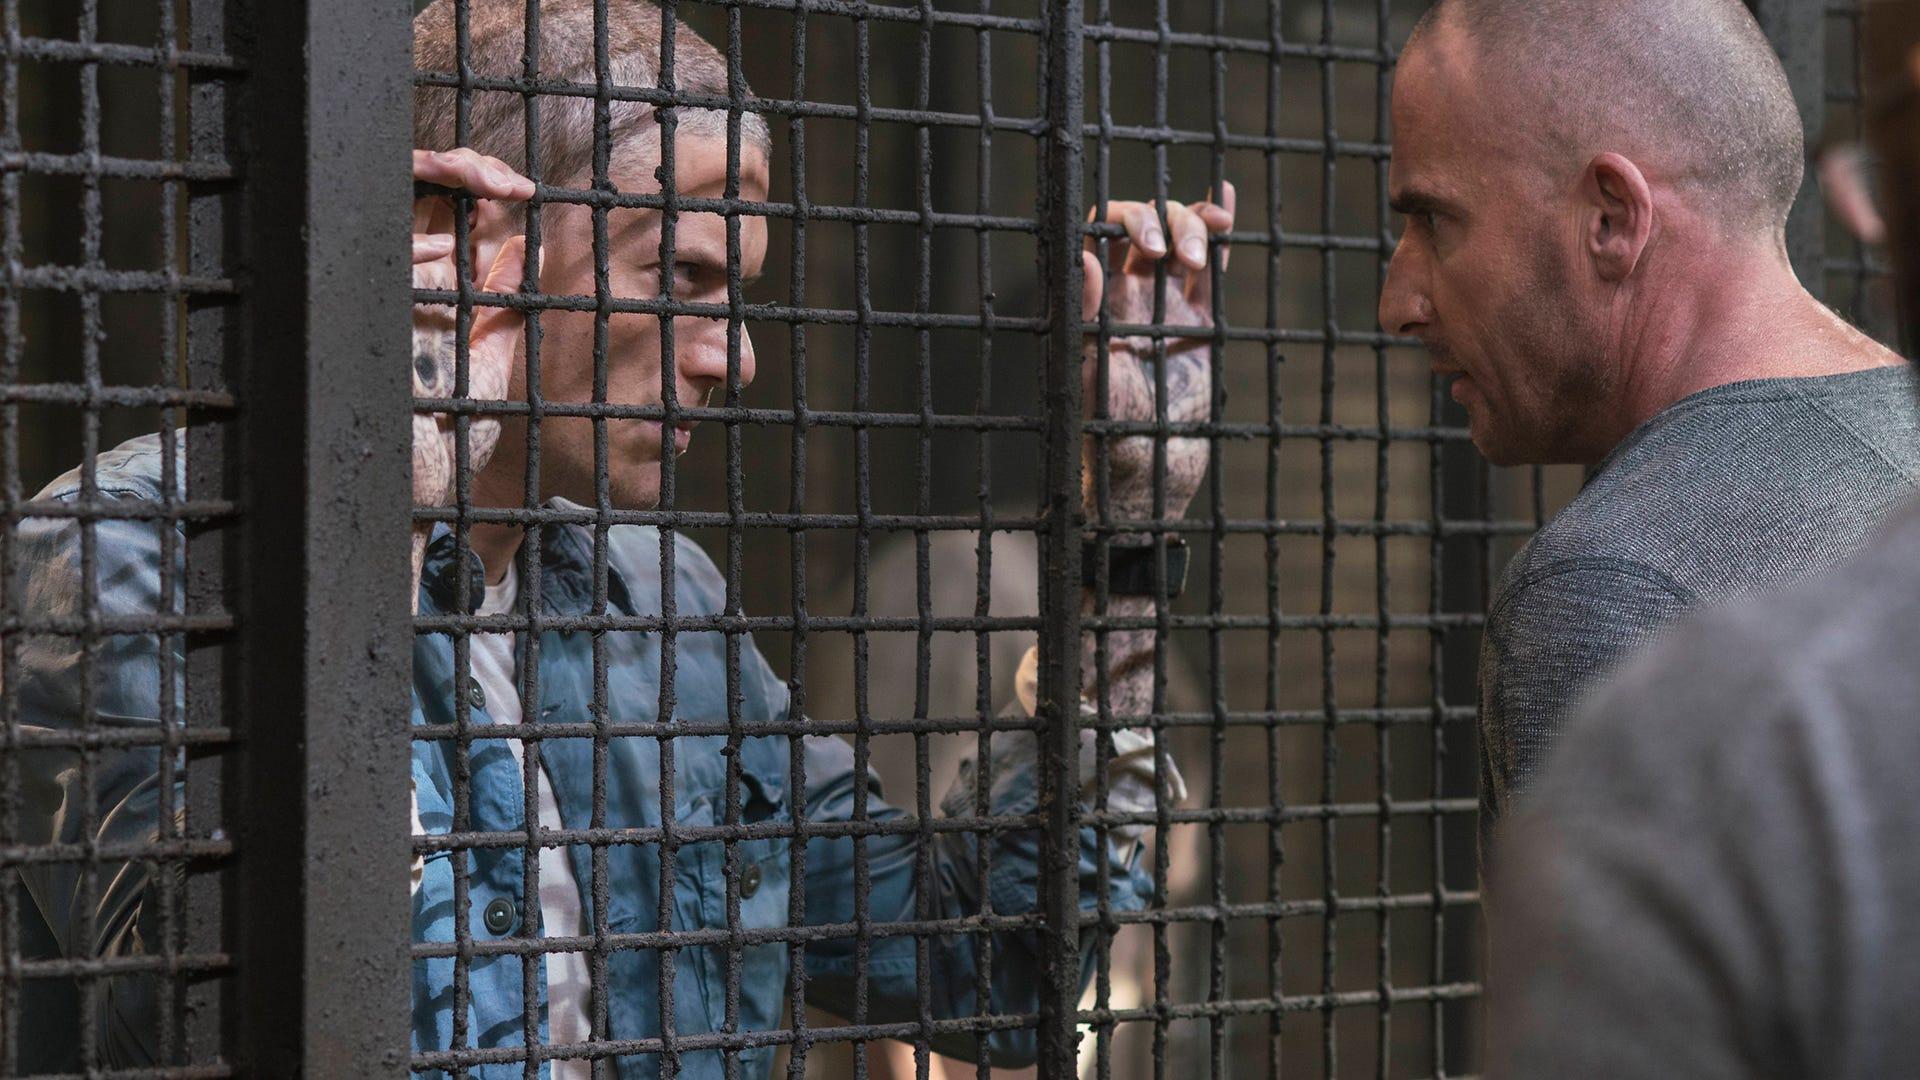 Wentworth Miller, Dominic Purcell; Prison Break